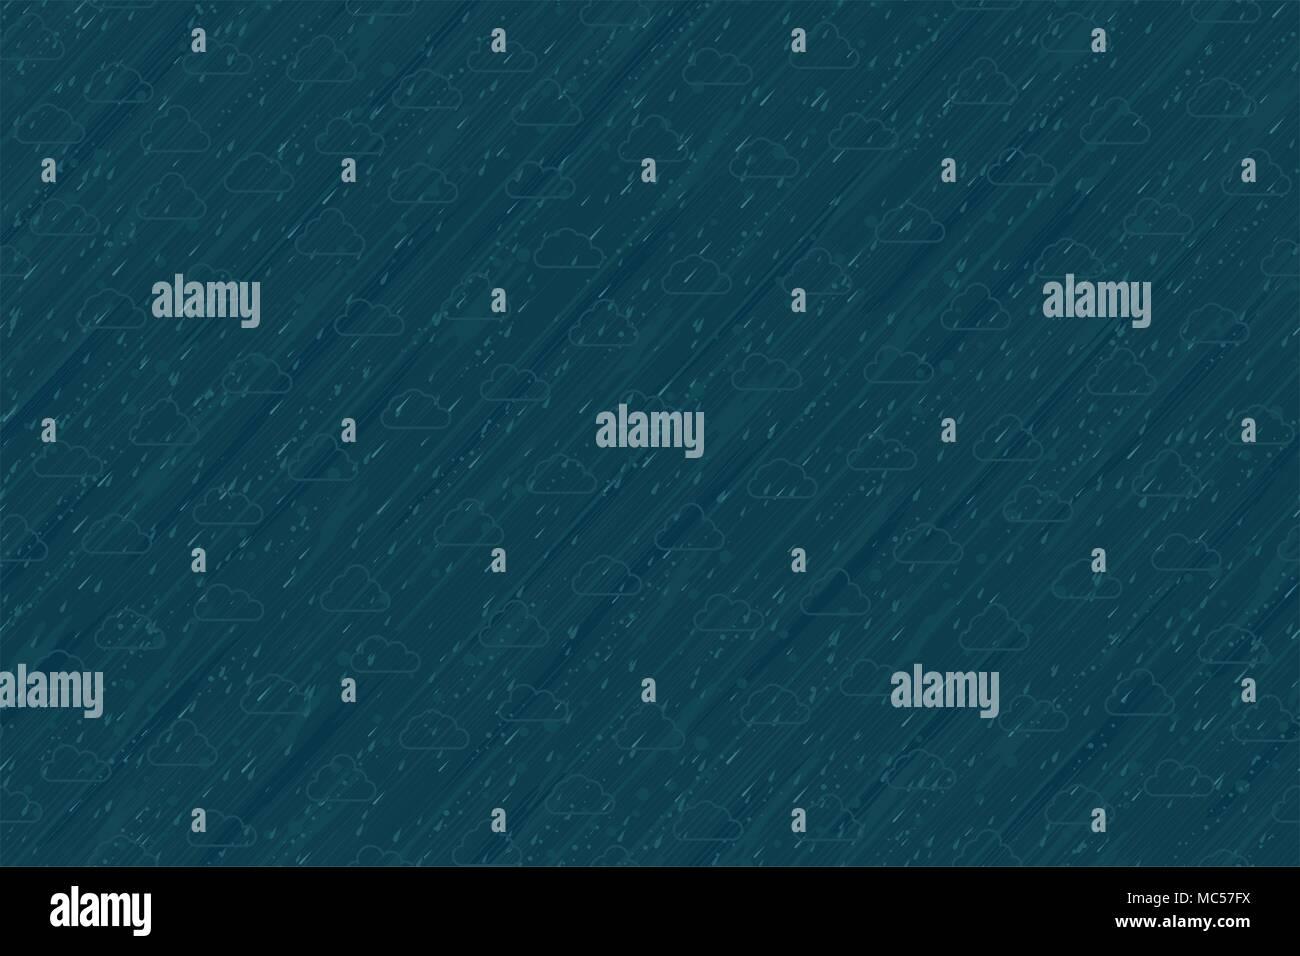 Rain streaming, seamless vector texture pattern, horizontal background - Stock Vector